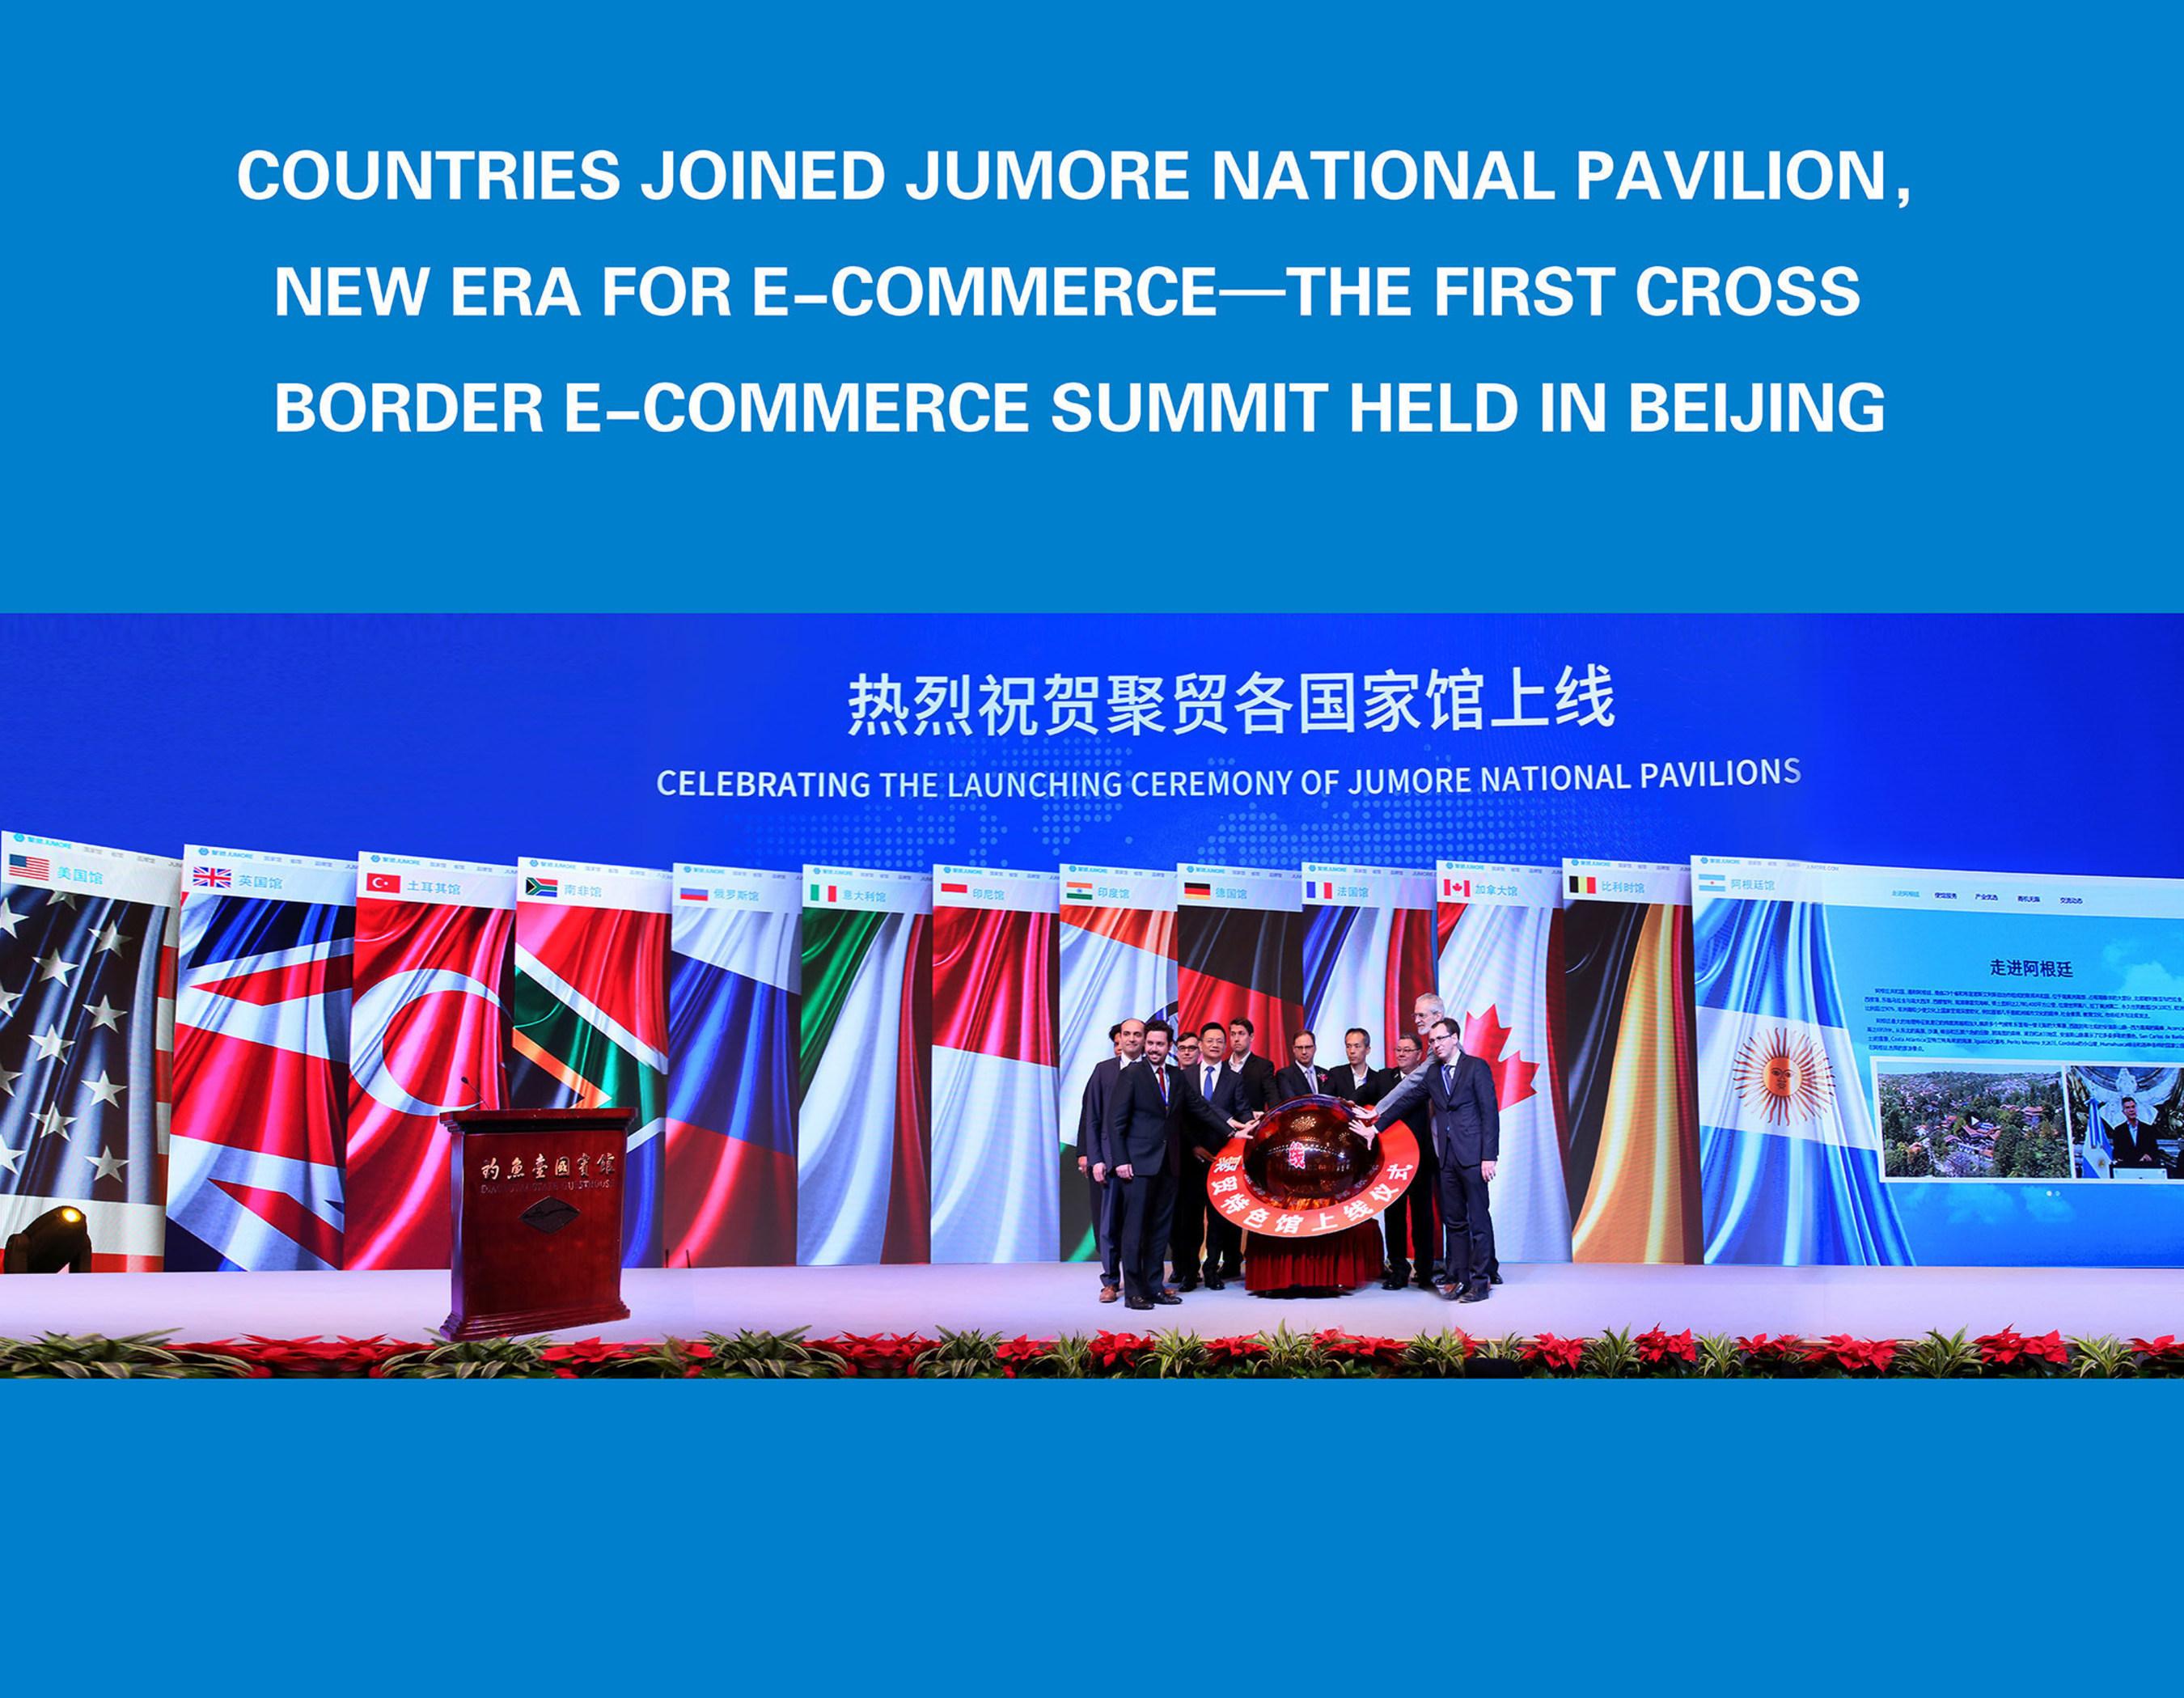 JUMORE National Pavilion Launching Ceremony